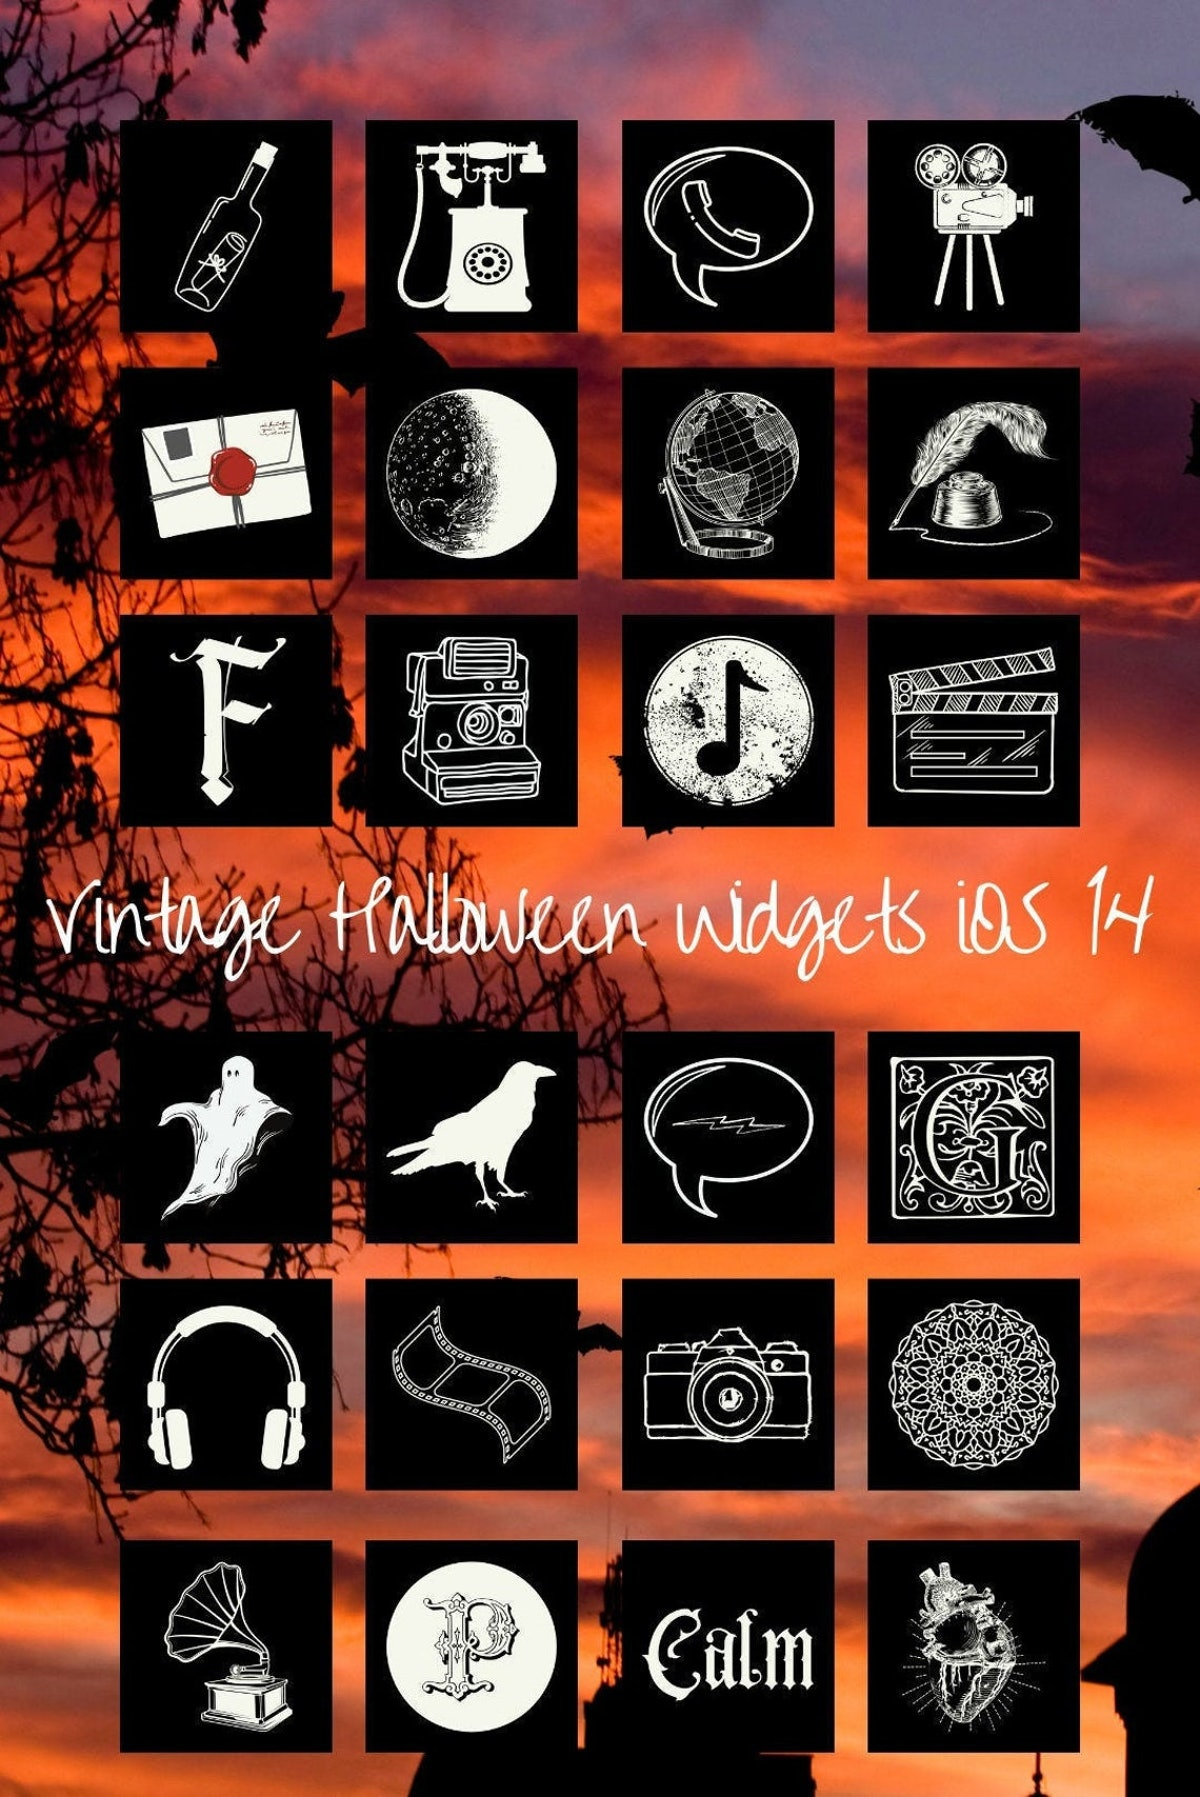 Vintage Halloween iPhone Widget Icon Pack